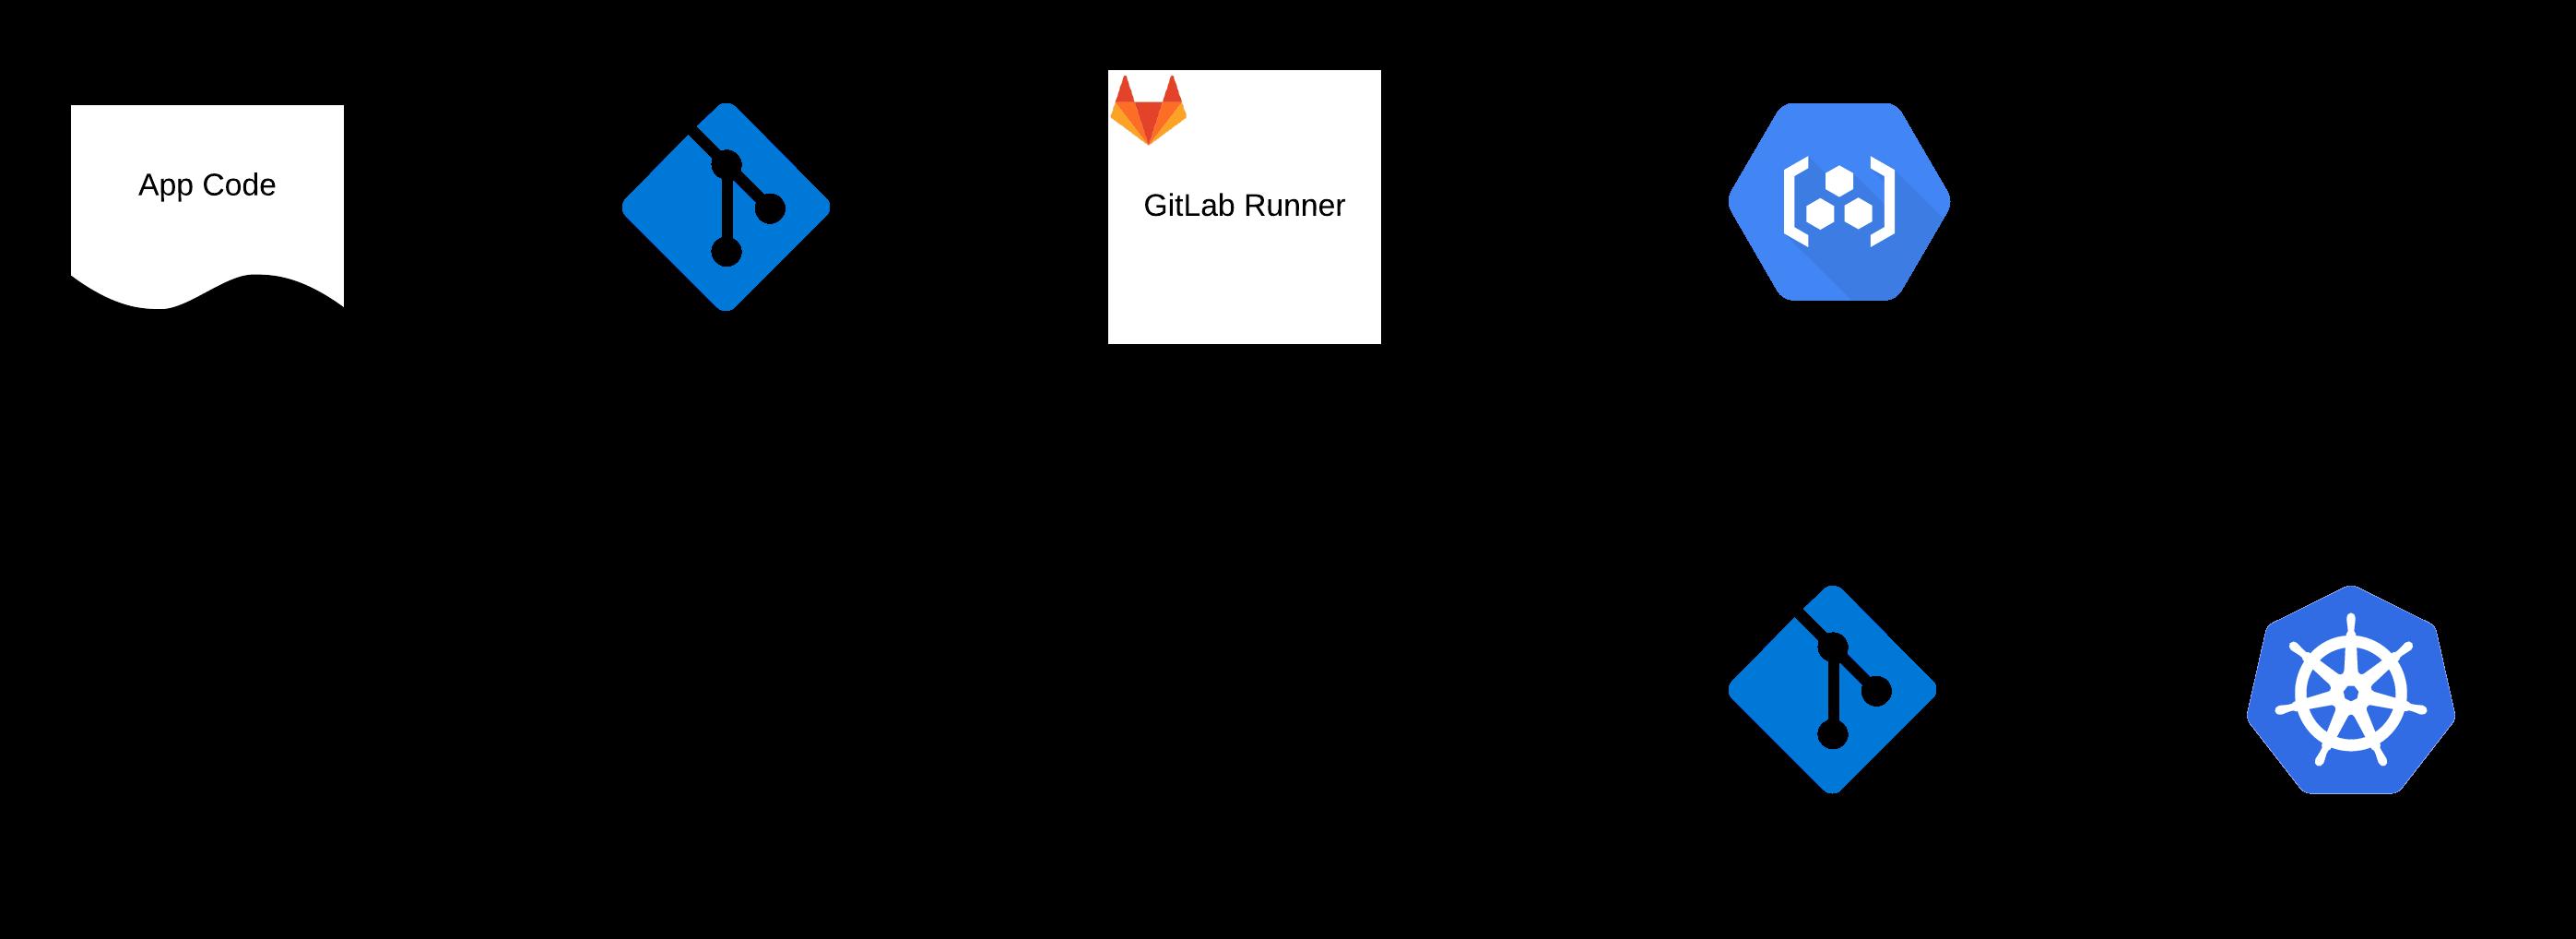 Platform Deployment Pipeline architectural diagram